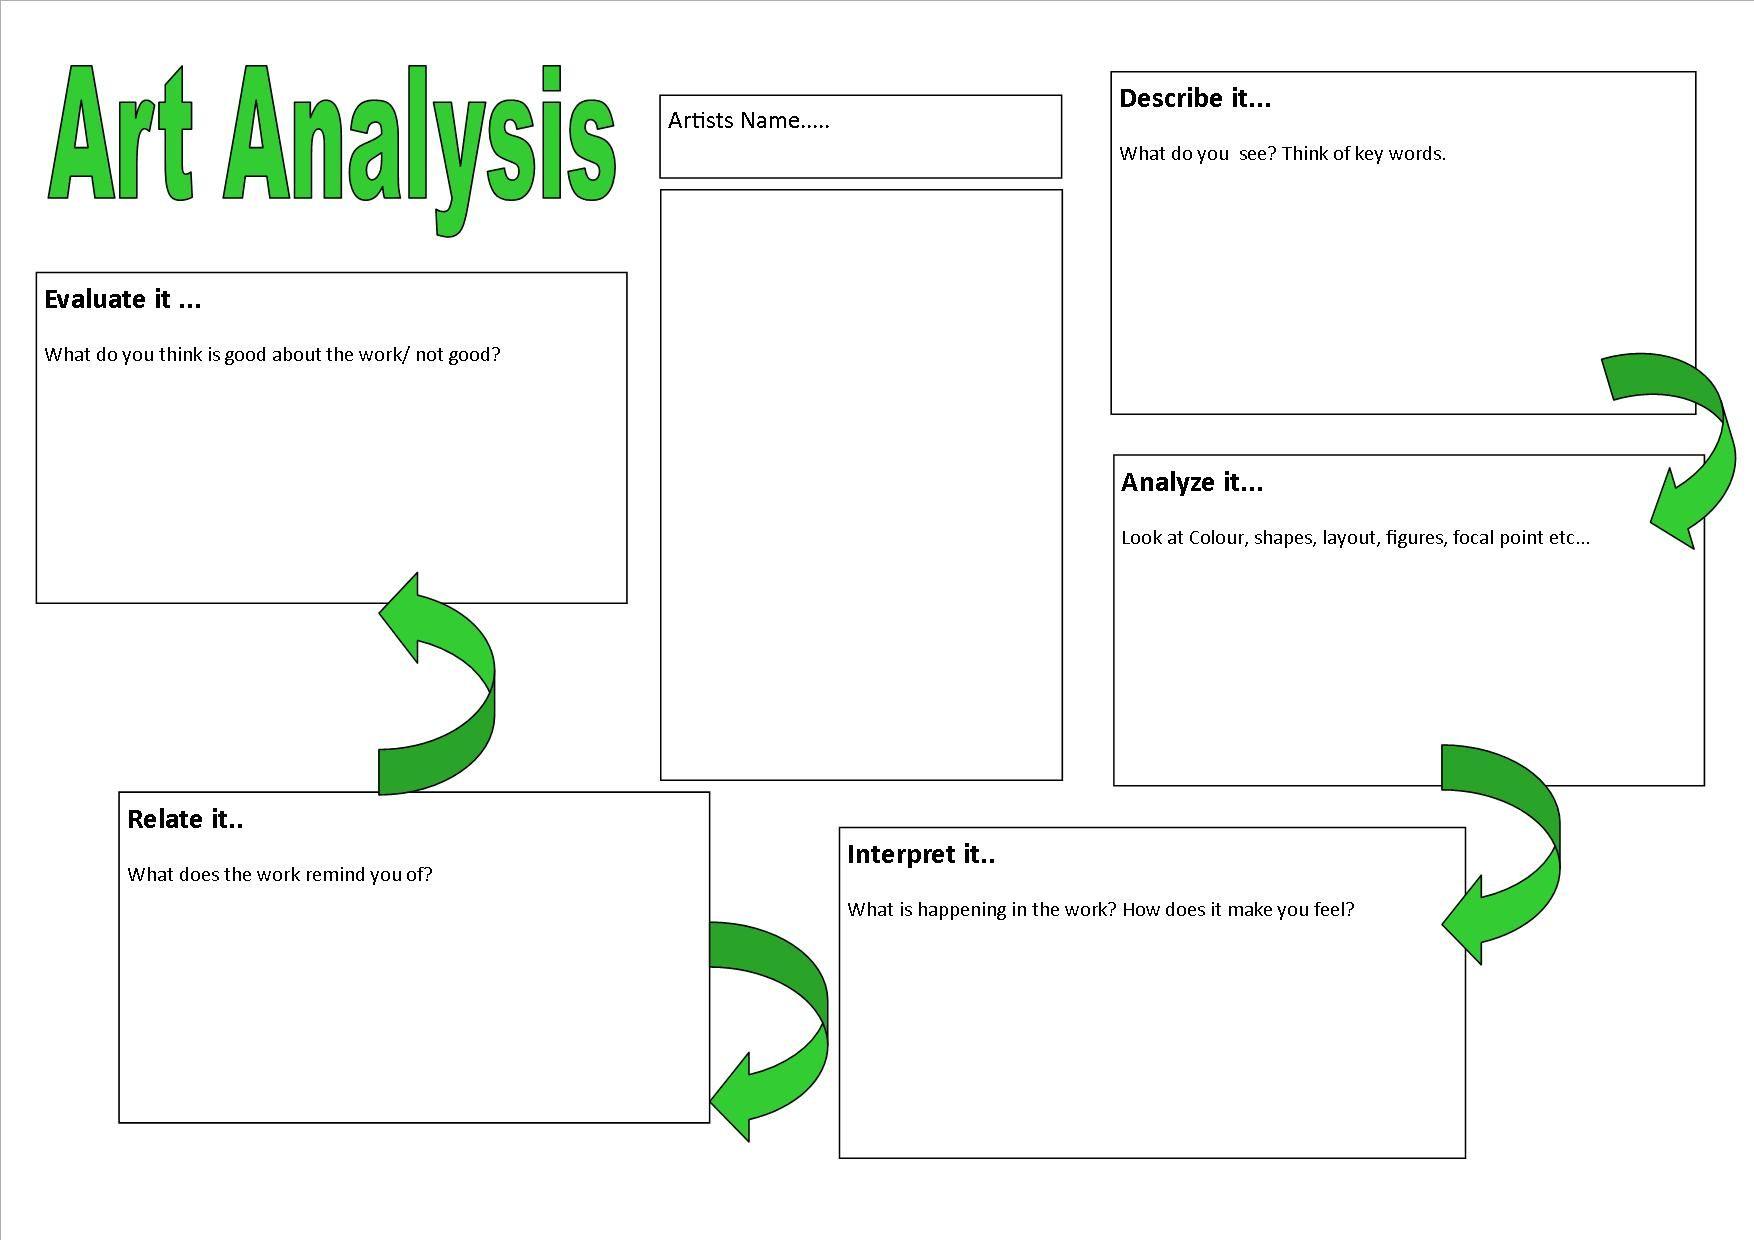 Artysis Sheet Work Through Each Section Writing At